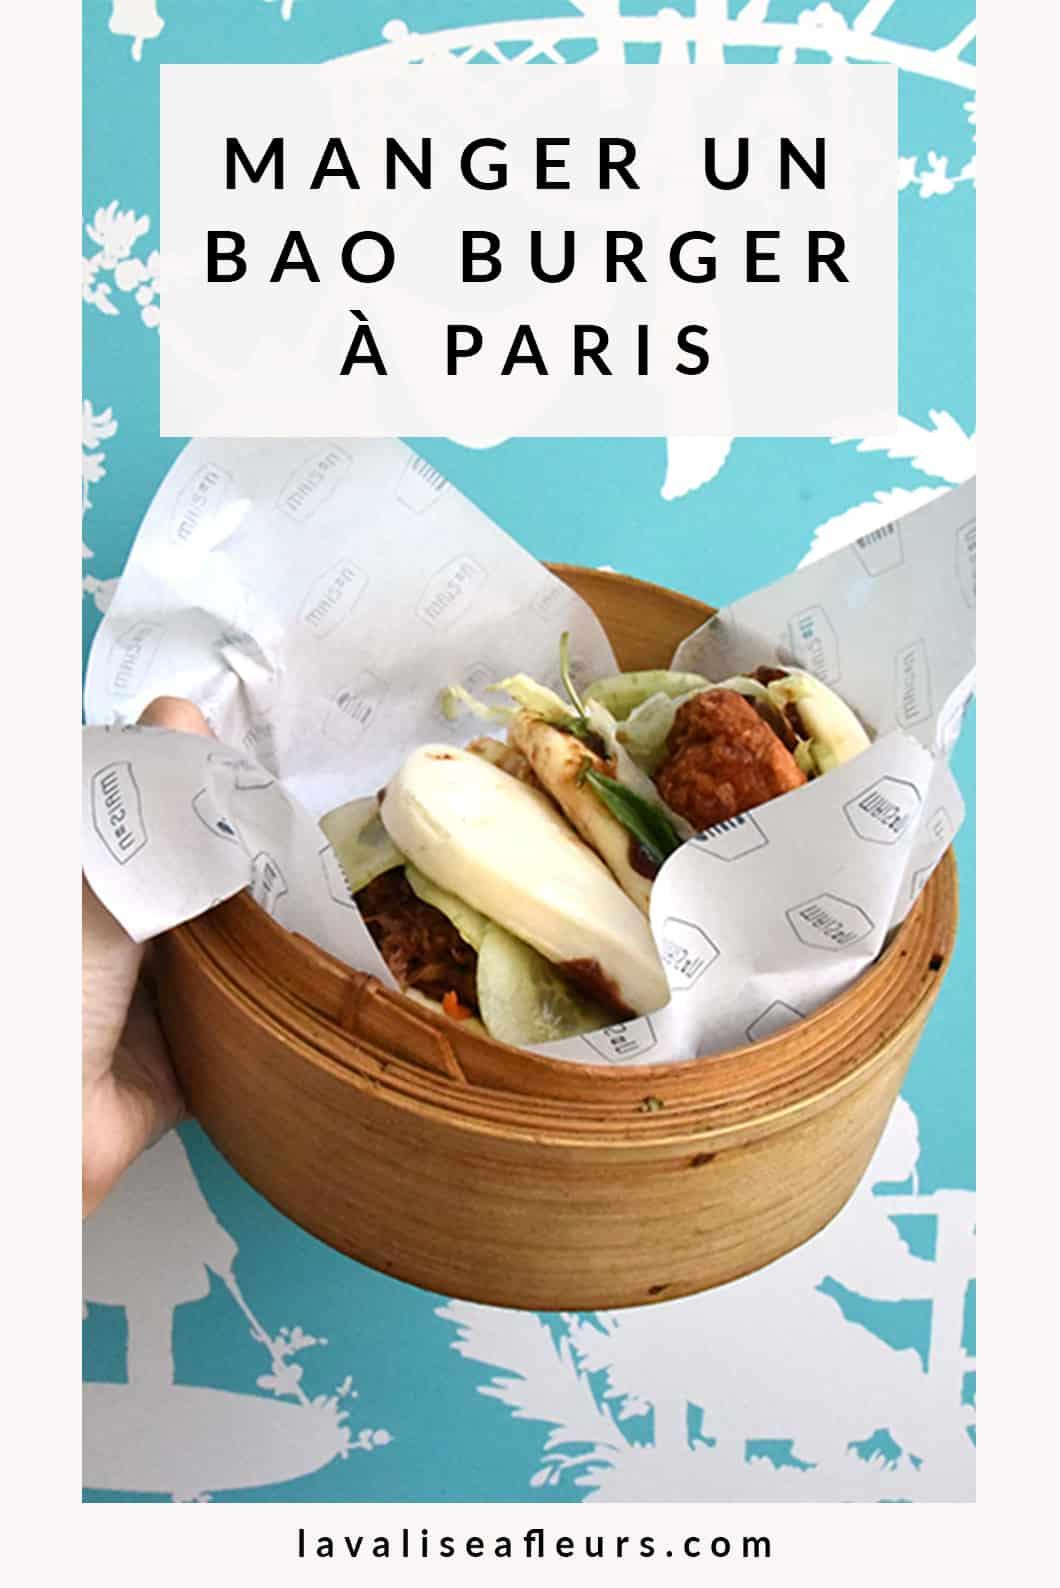 Manger un bao burger à Paris